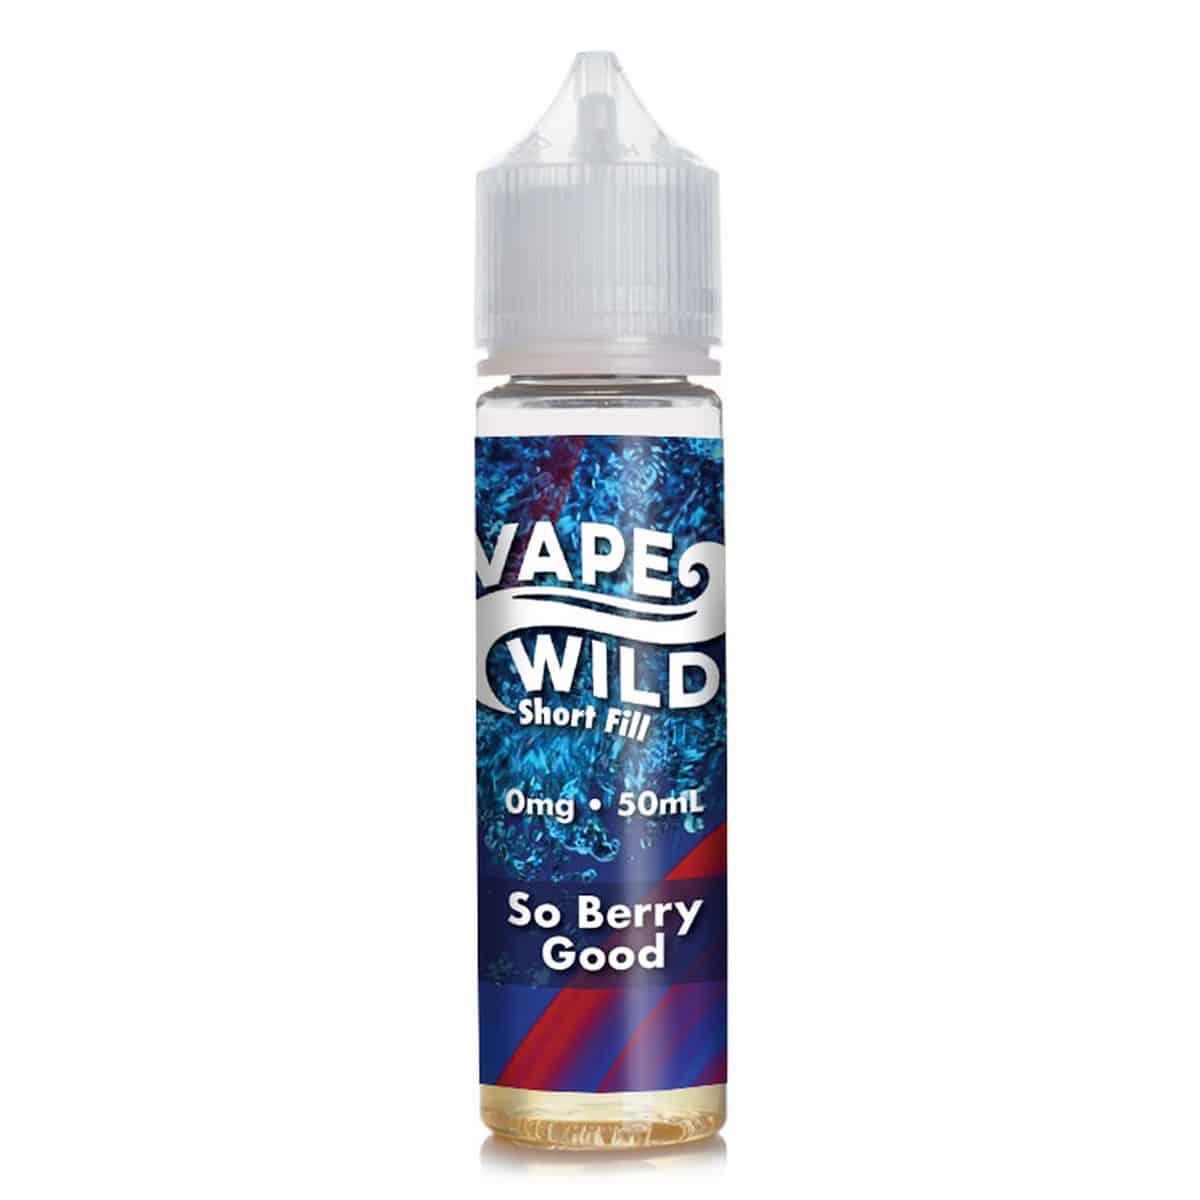 So Berry Good Vape Wild Shortfill 50ml